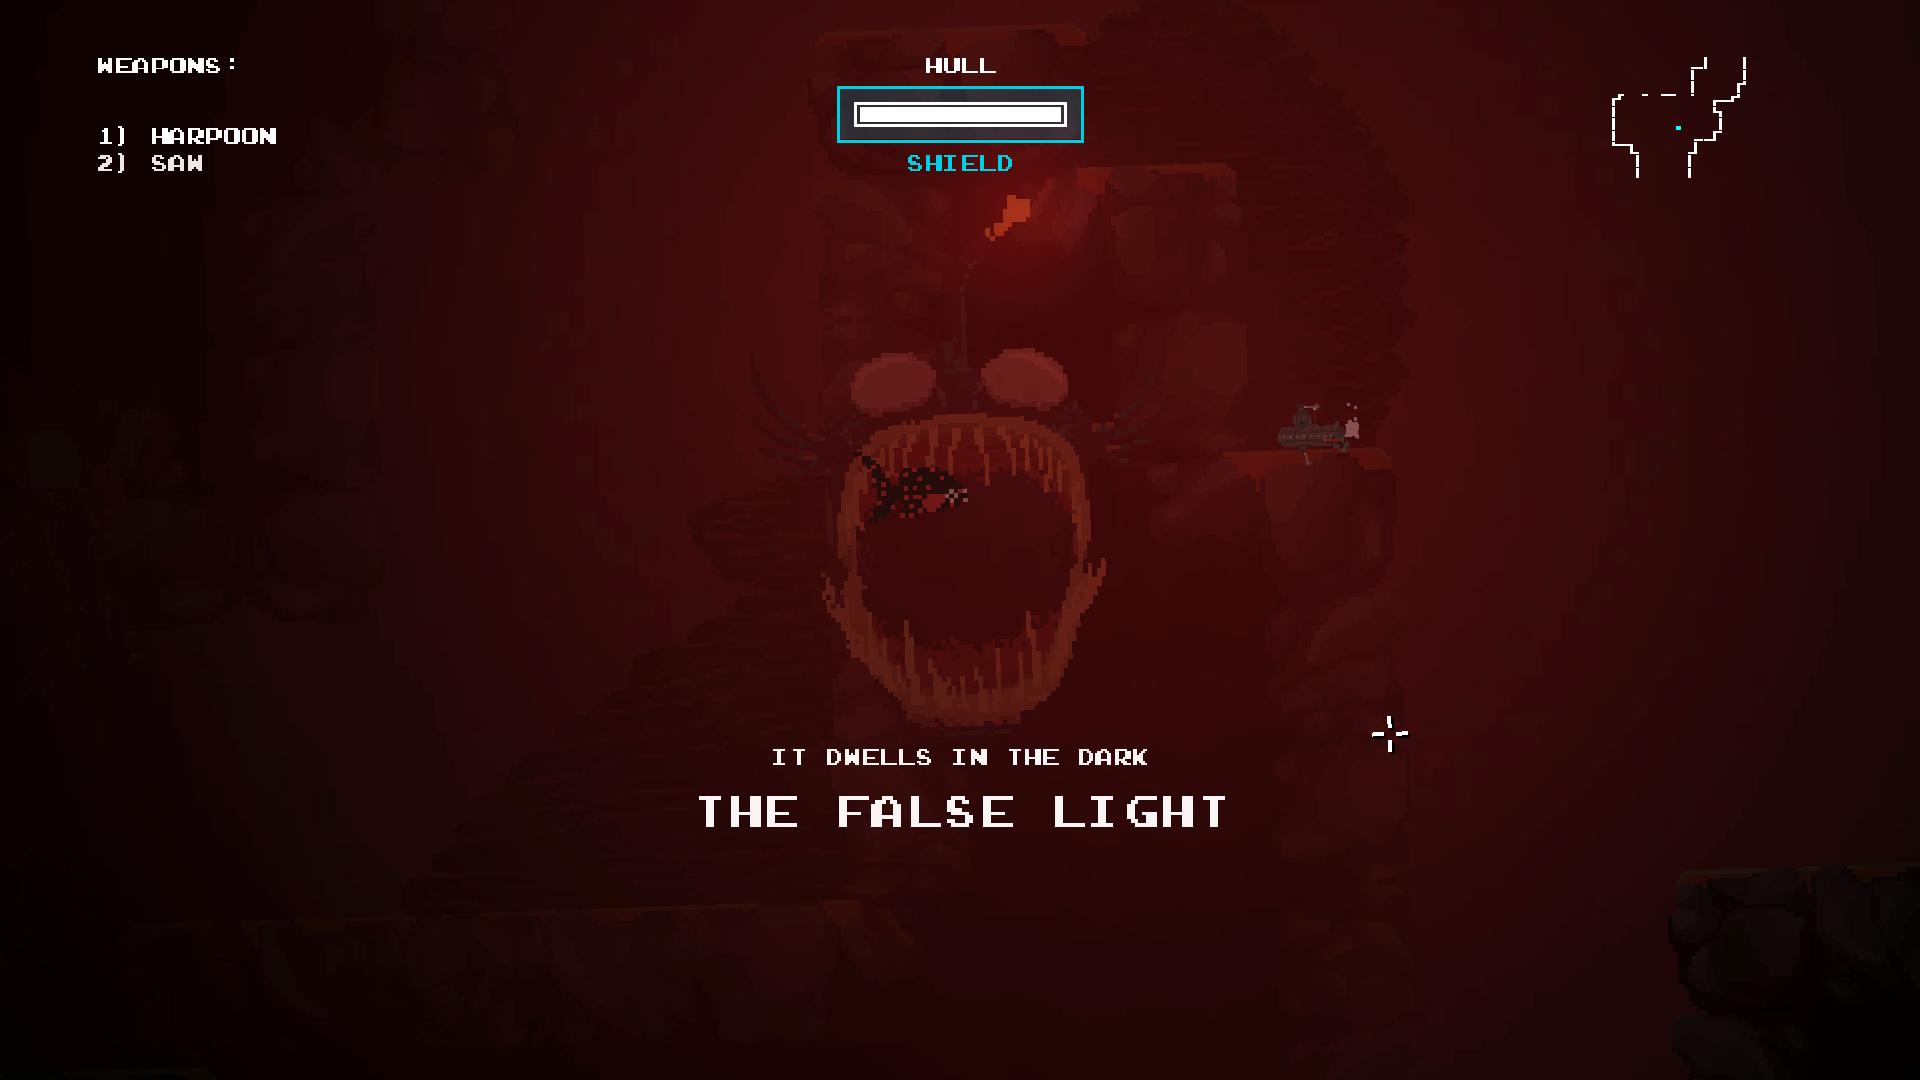 TheFalseLight